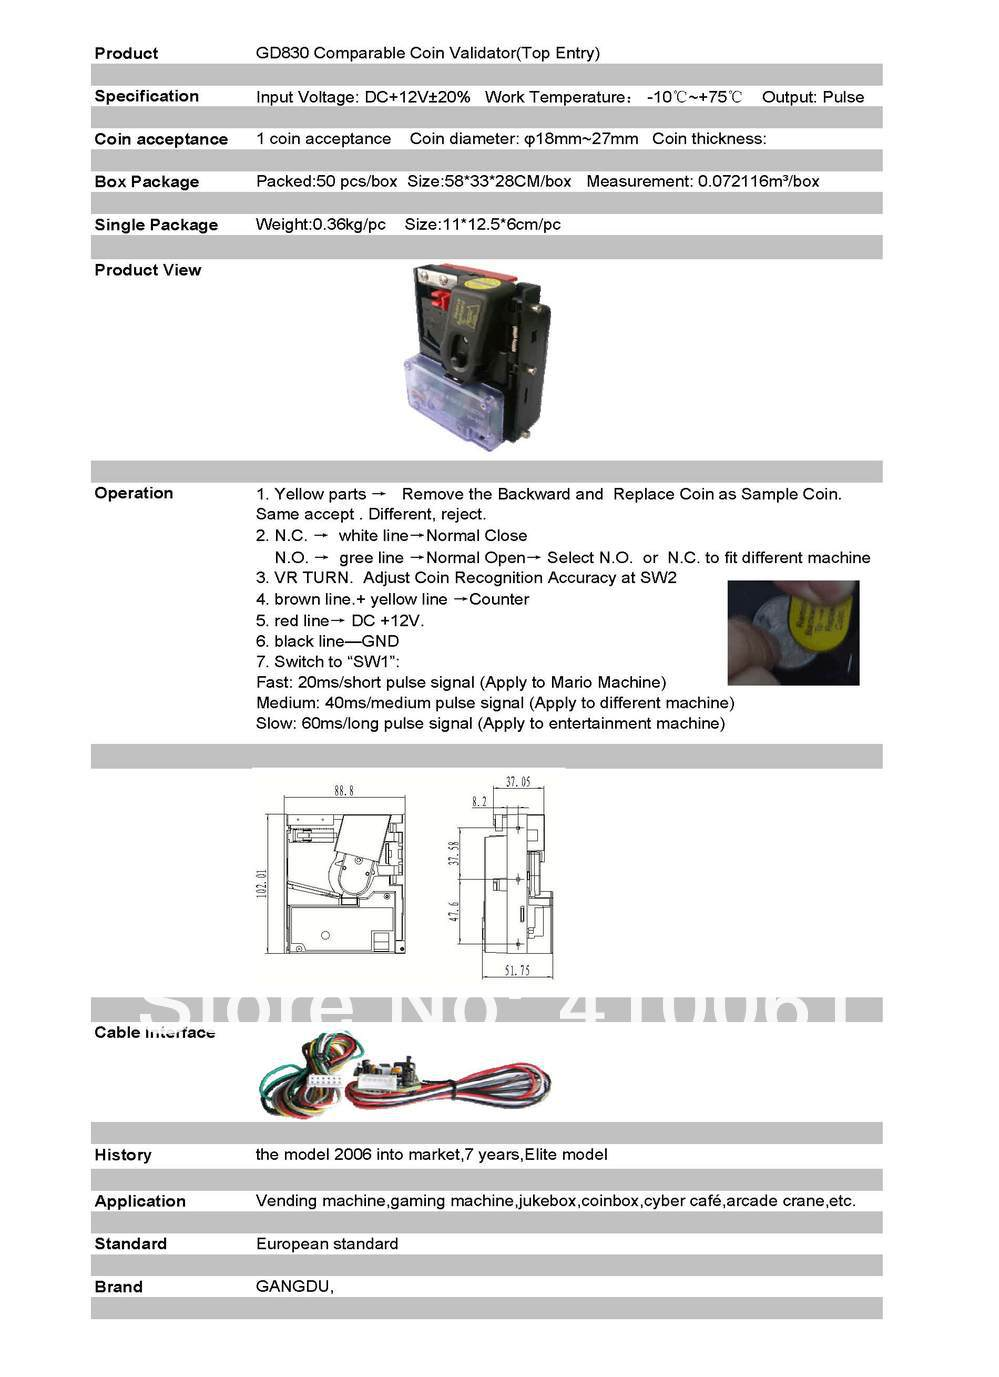 830 tech manual.jpg